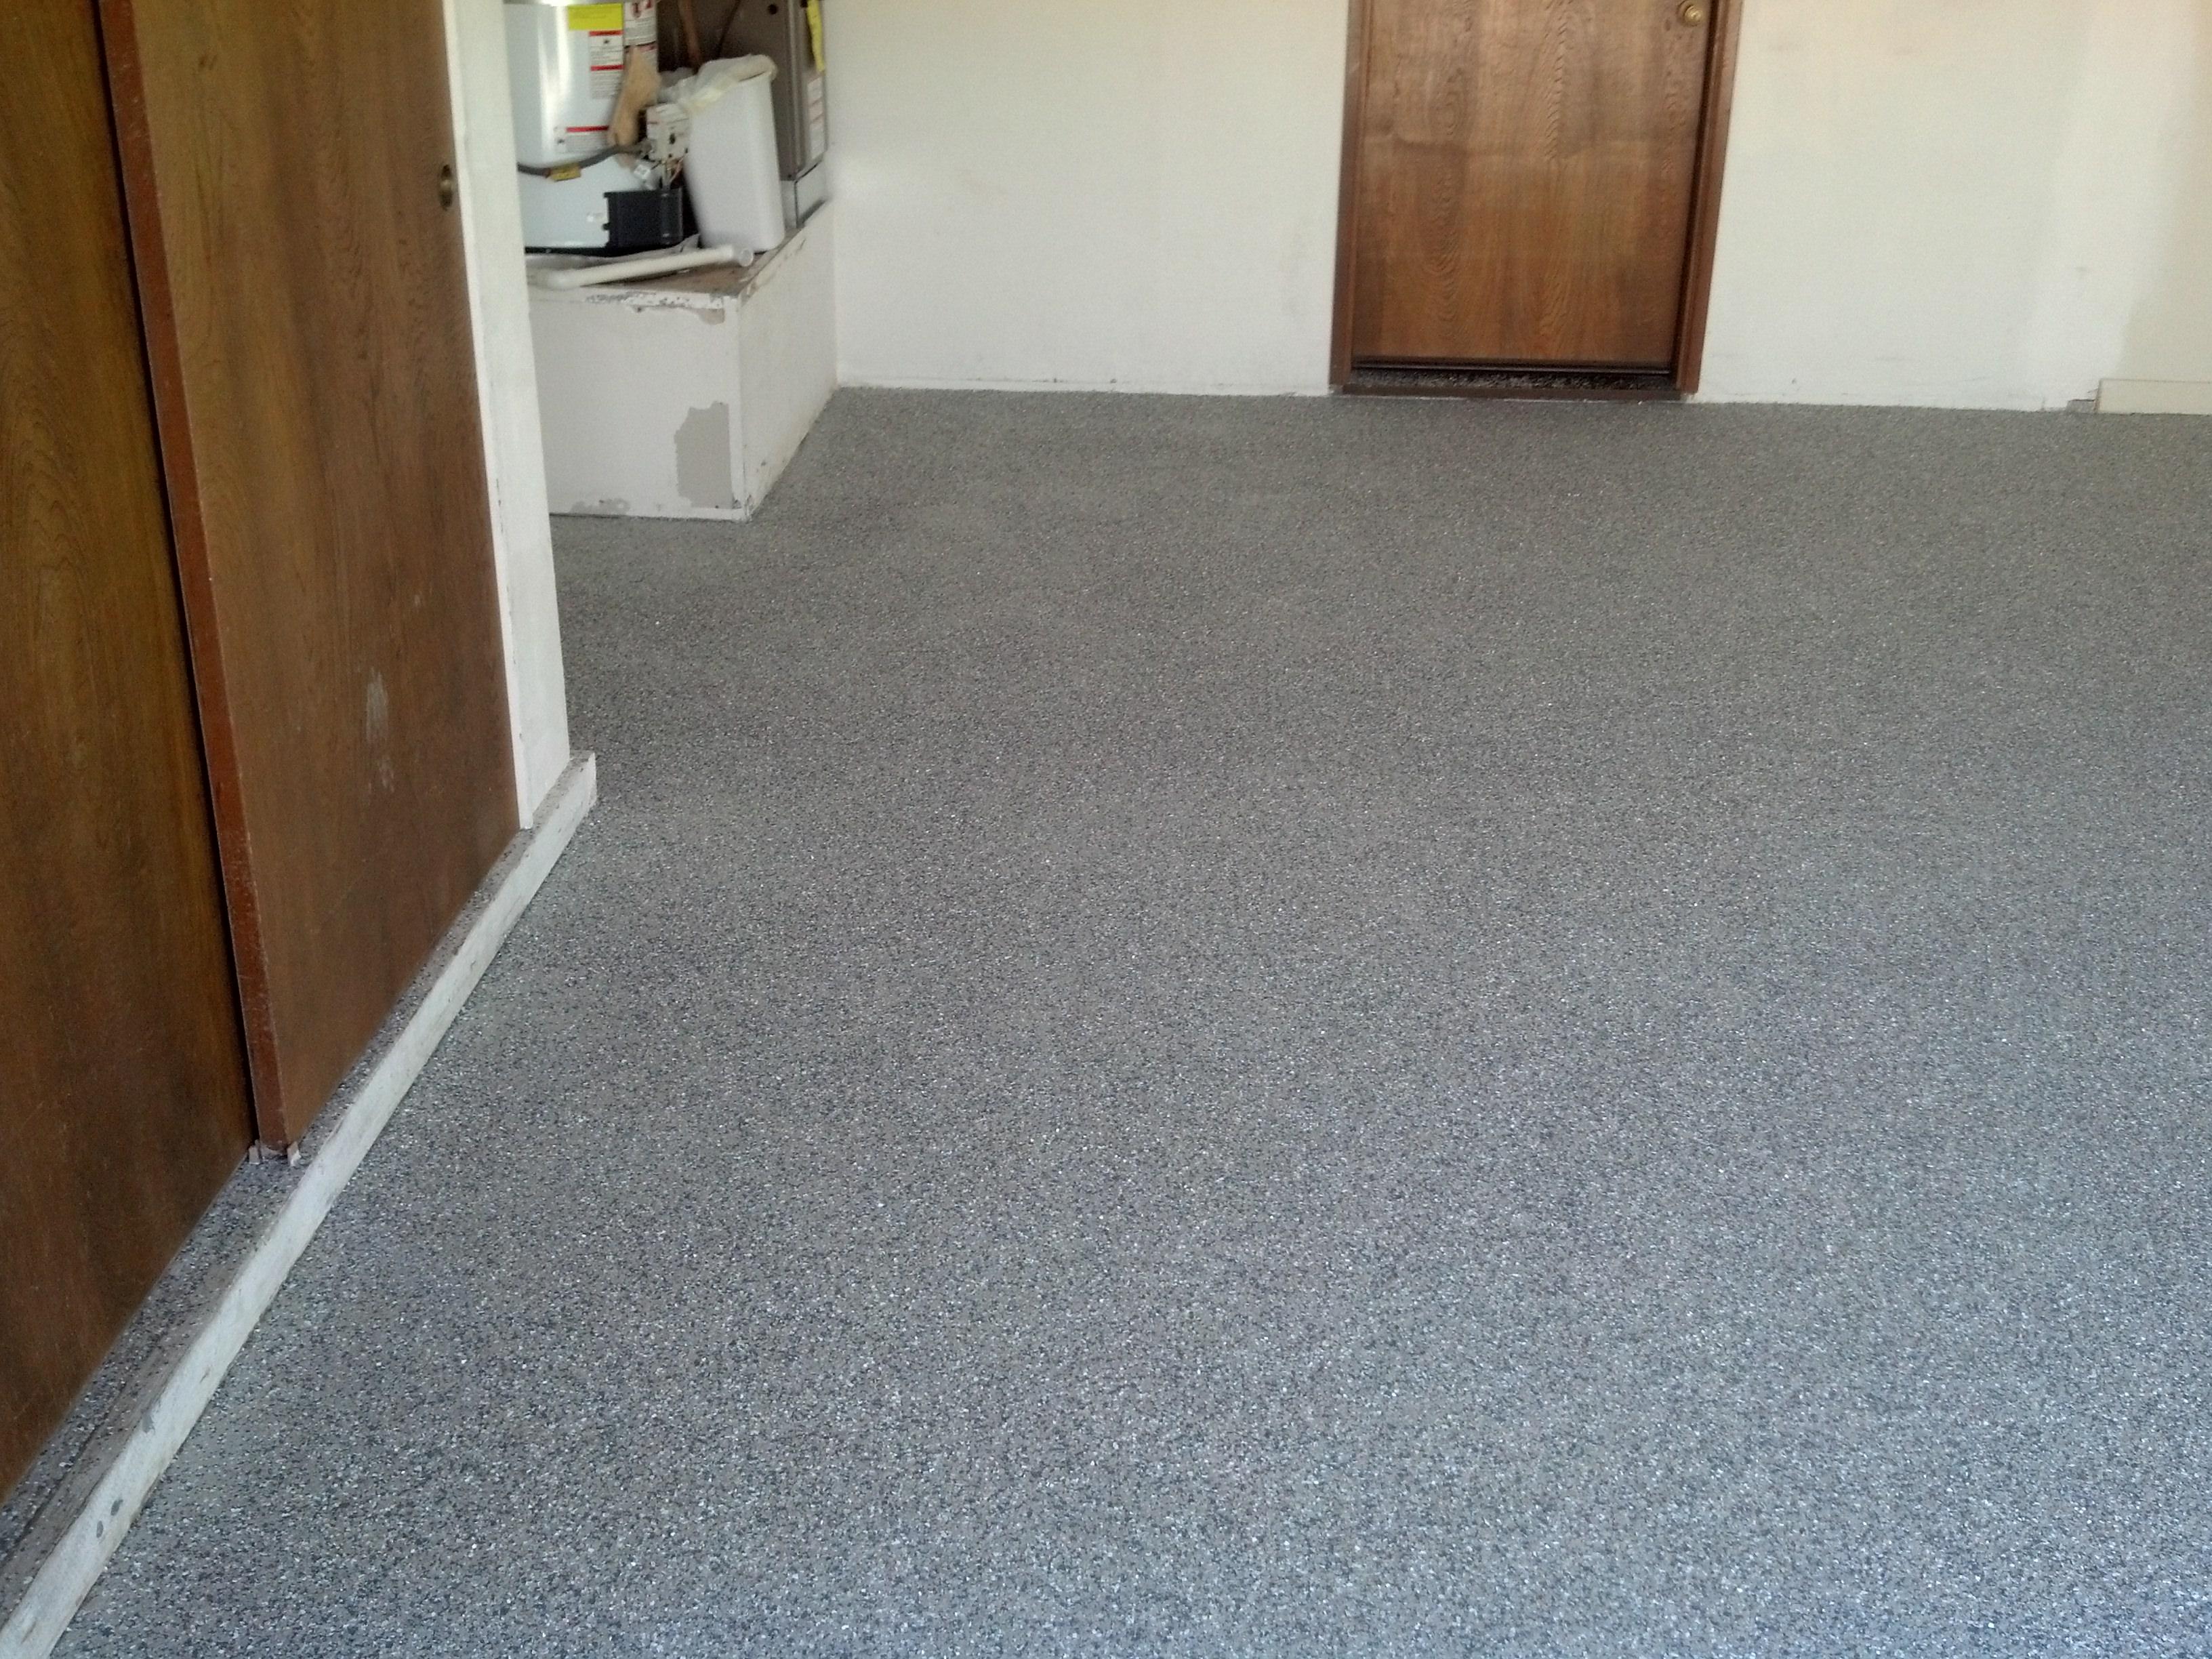 Westcoats Liquid Granite Epoxy Flooring Selected For